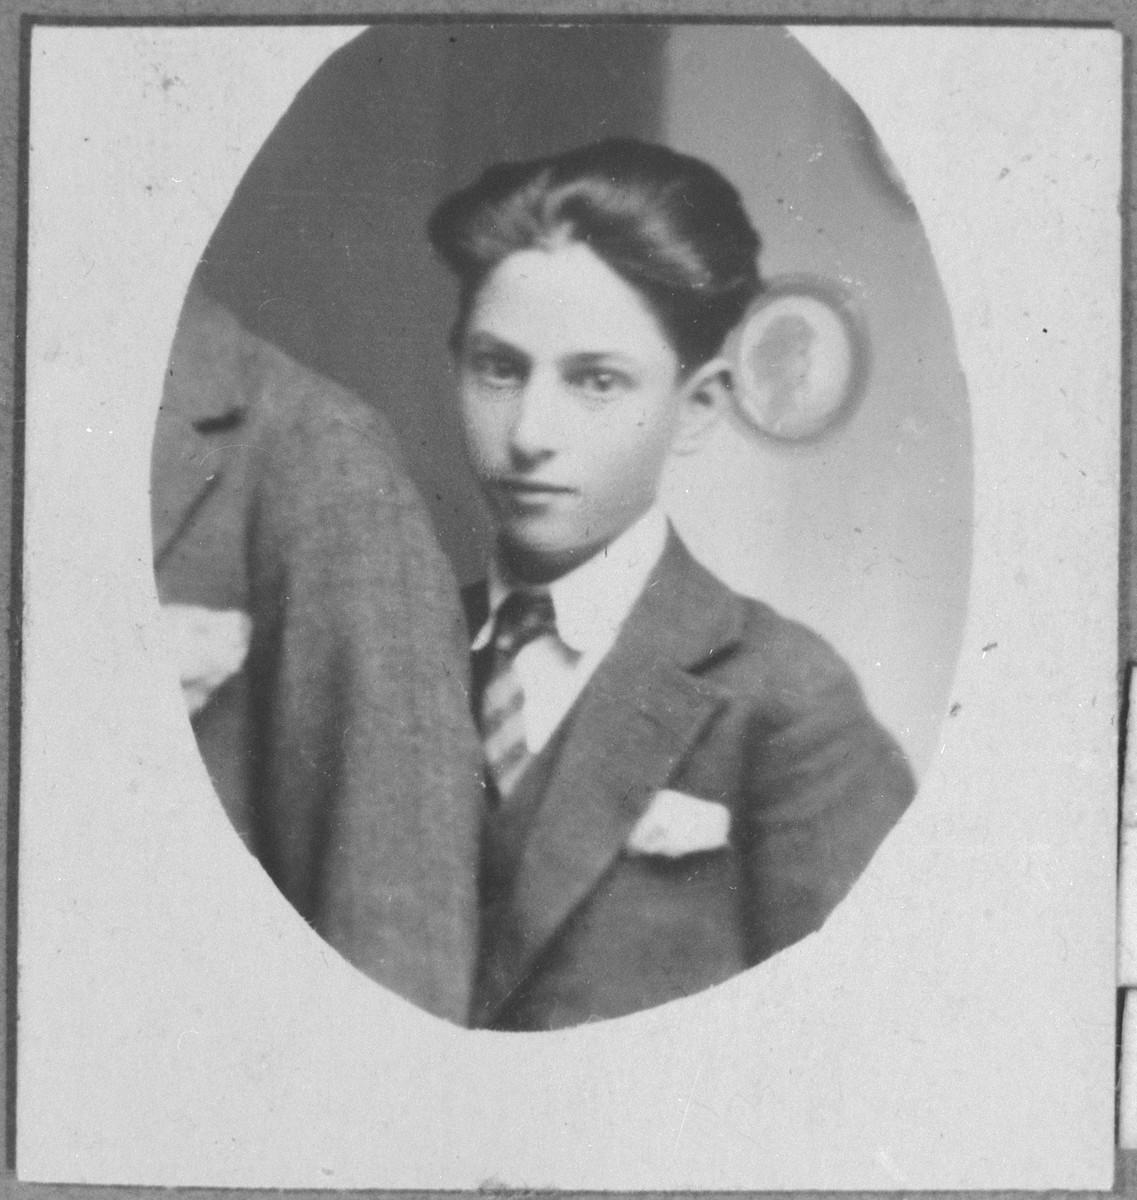 Portrait of Mentesh Pardo.  He was a second-hand dealer.